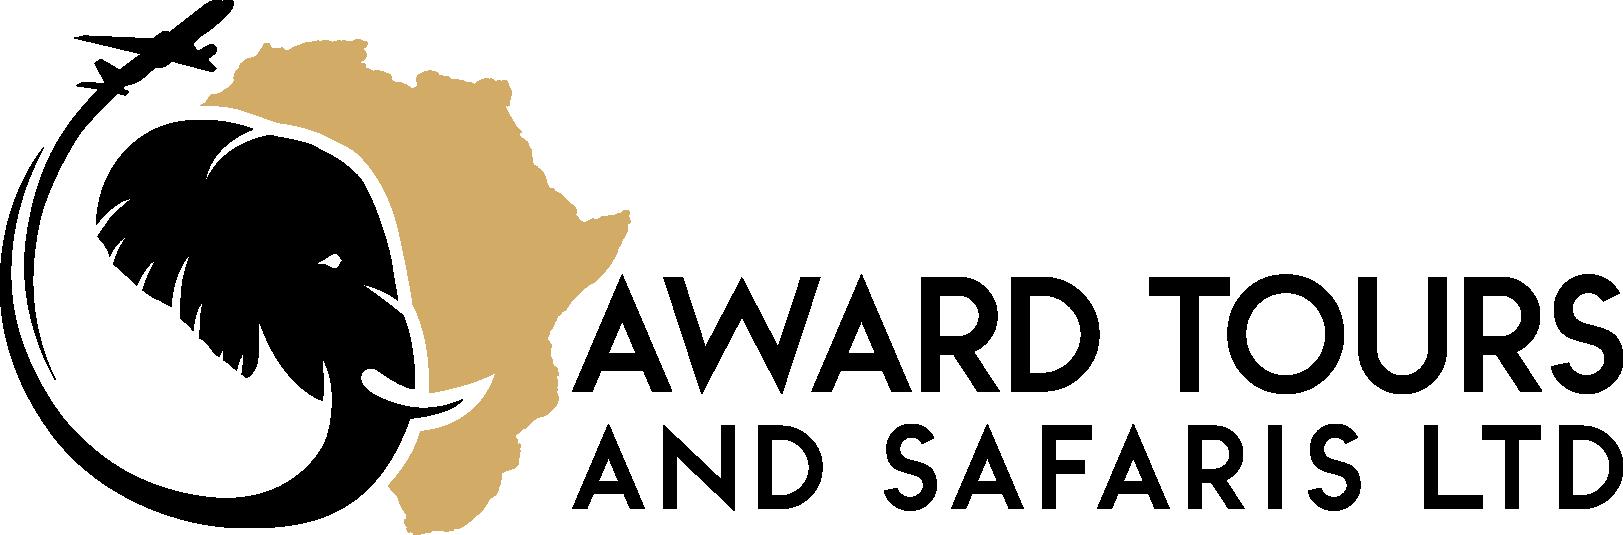 Award Tours and Safaris Ltd, Nairobi, Kenya